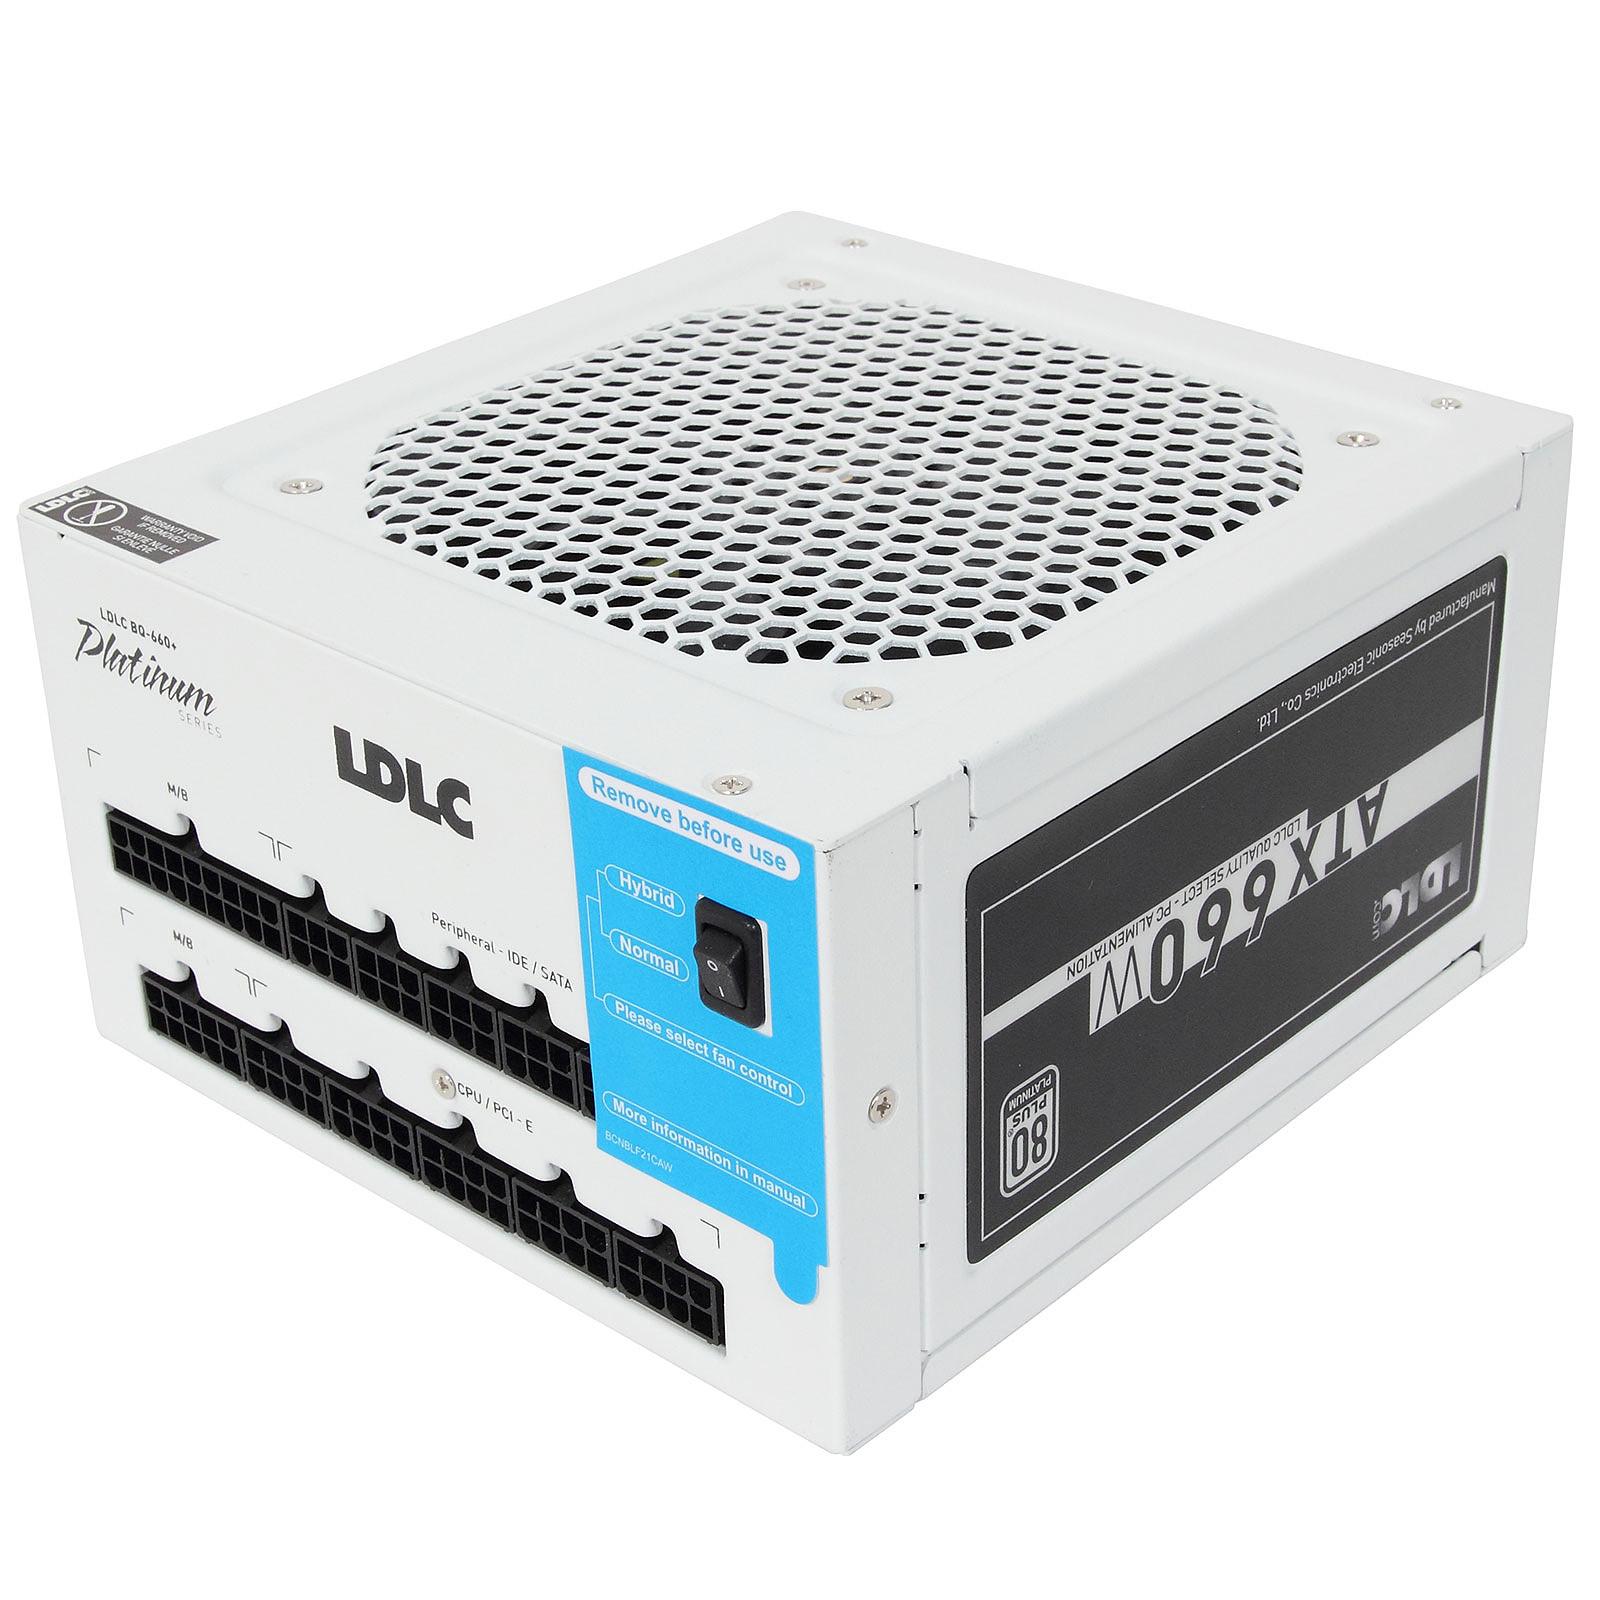 LDLC BQ-660+ Quality Select 80PLUS Platinum (Garantie 5 ans)